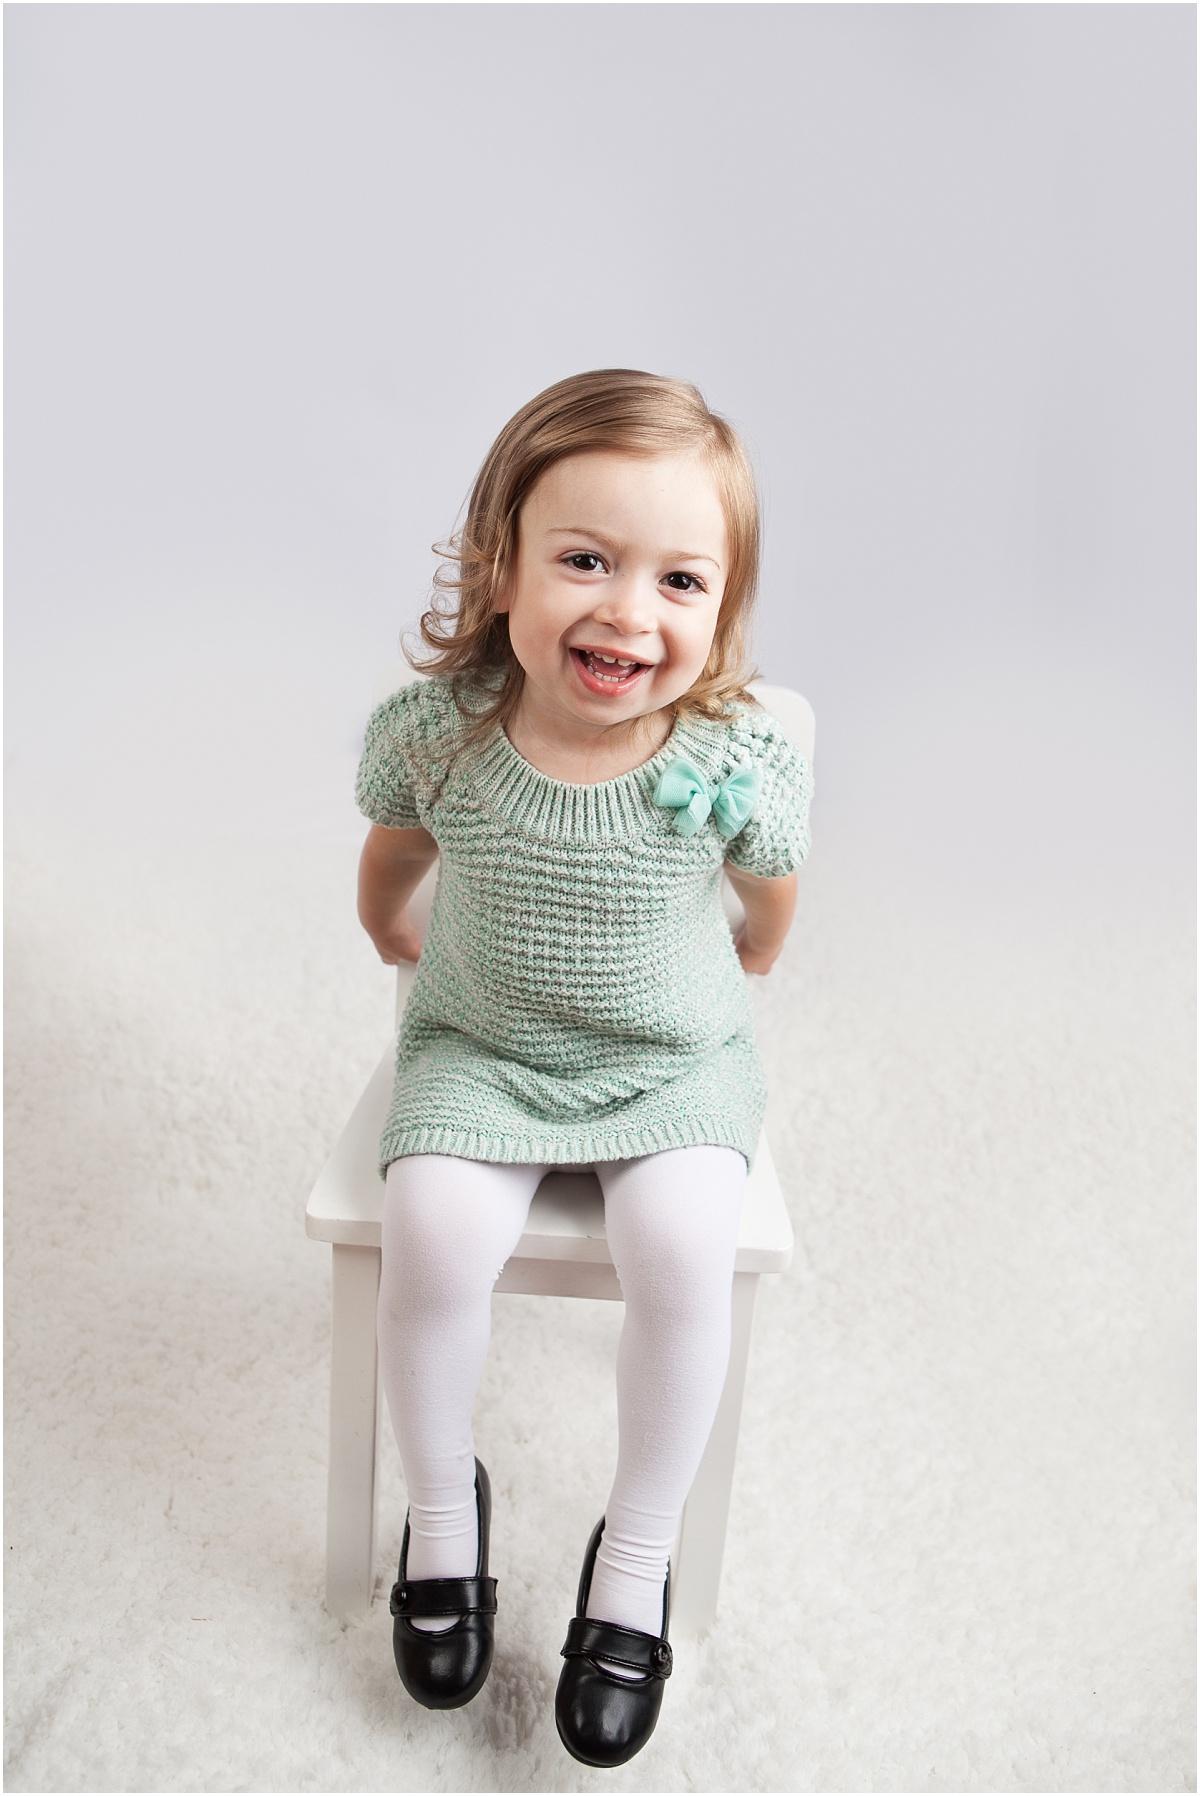 Portraits_Child Photography_Meridian Idaho__Leah Southwick Photography_0091.jpg